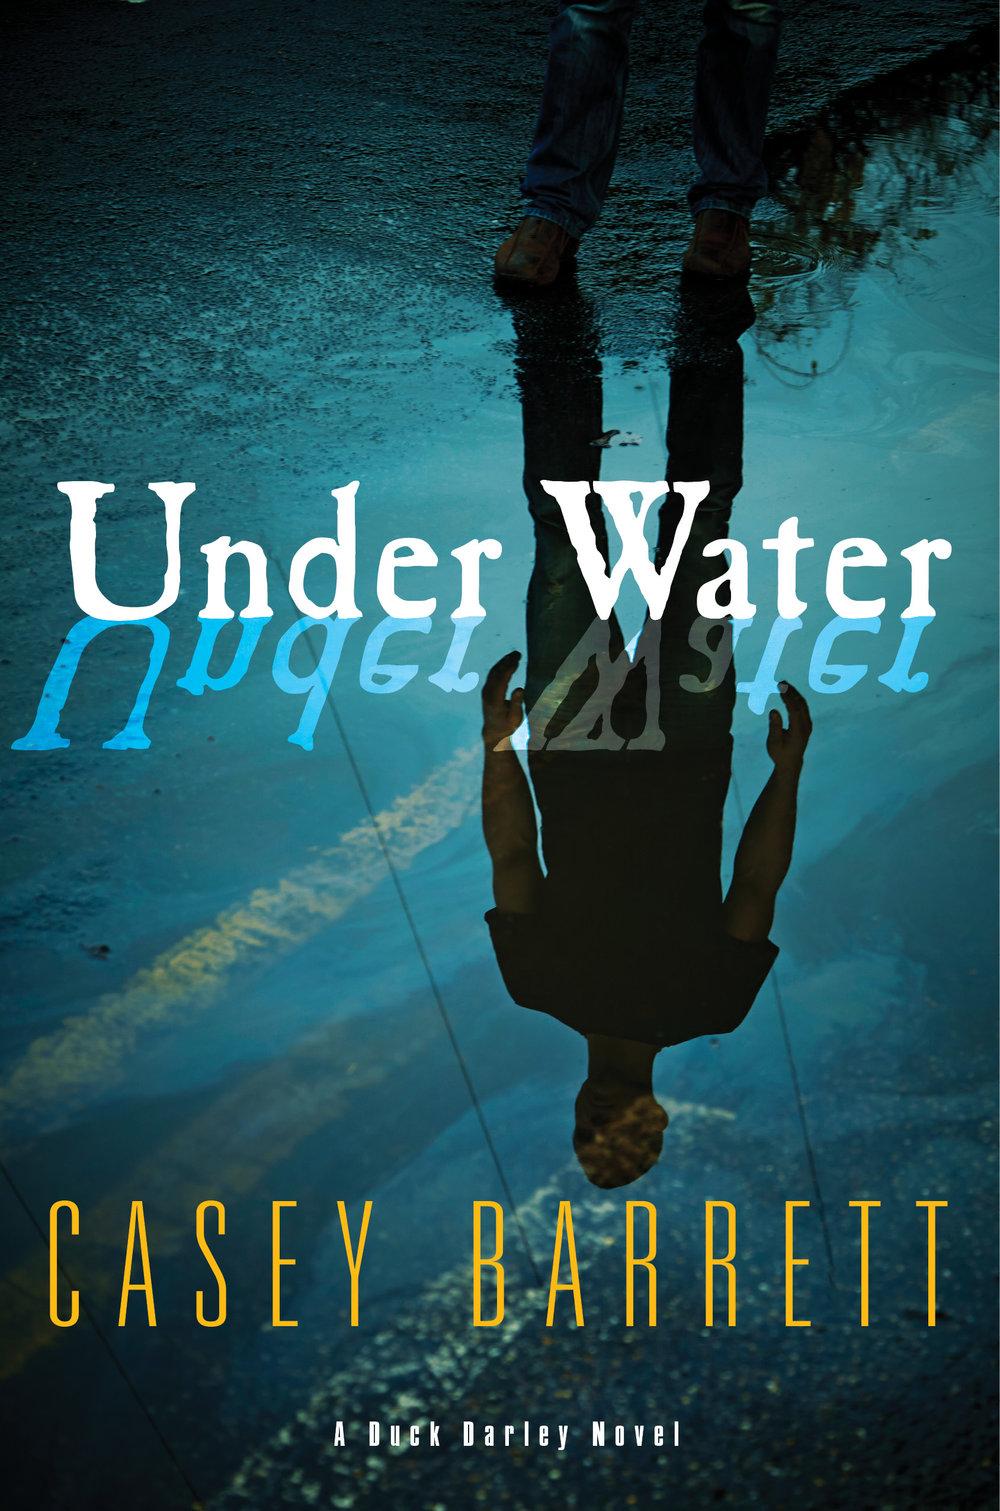 casey barrett, author, duck darley, swimmer, new york city, book